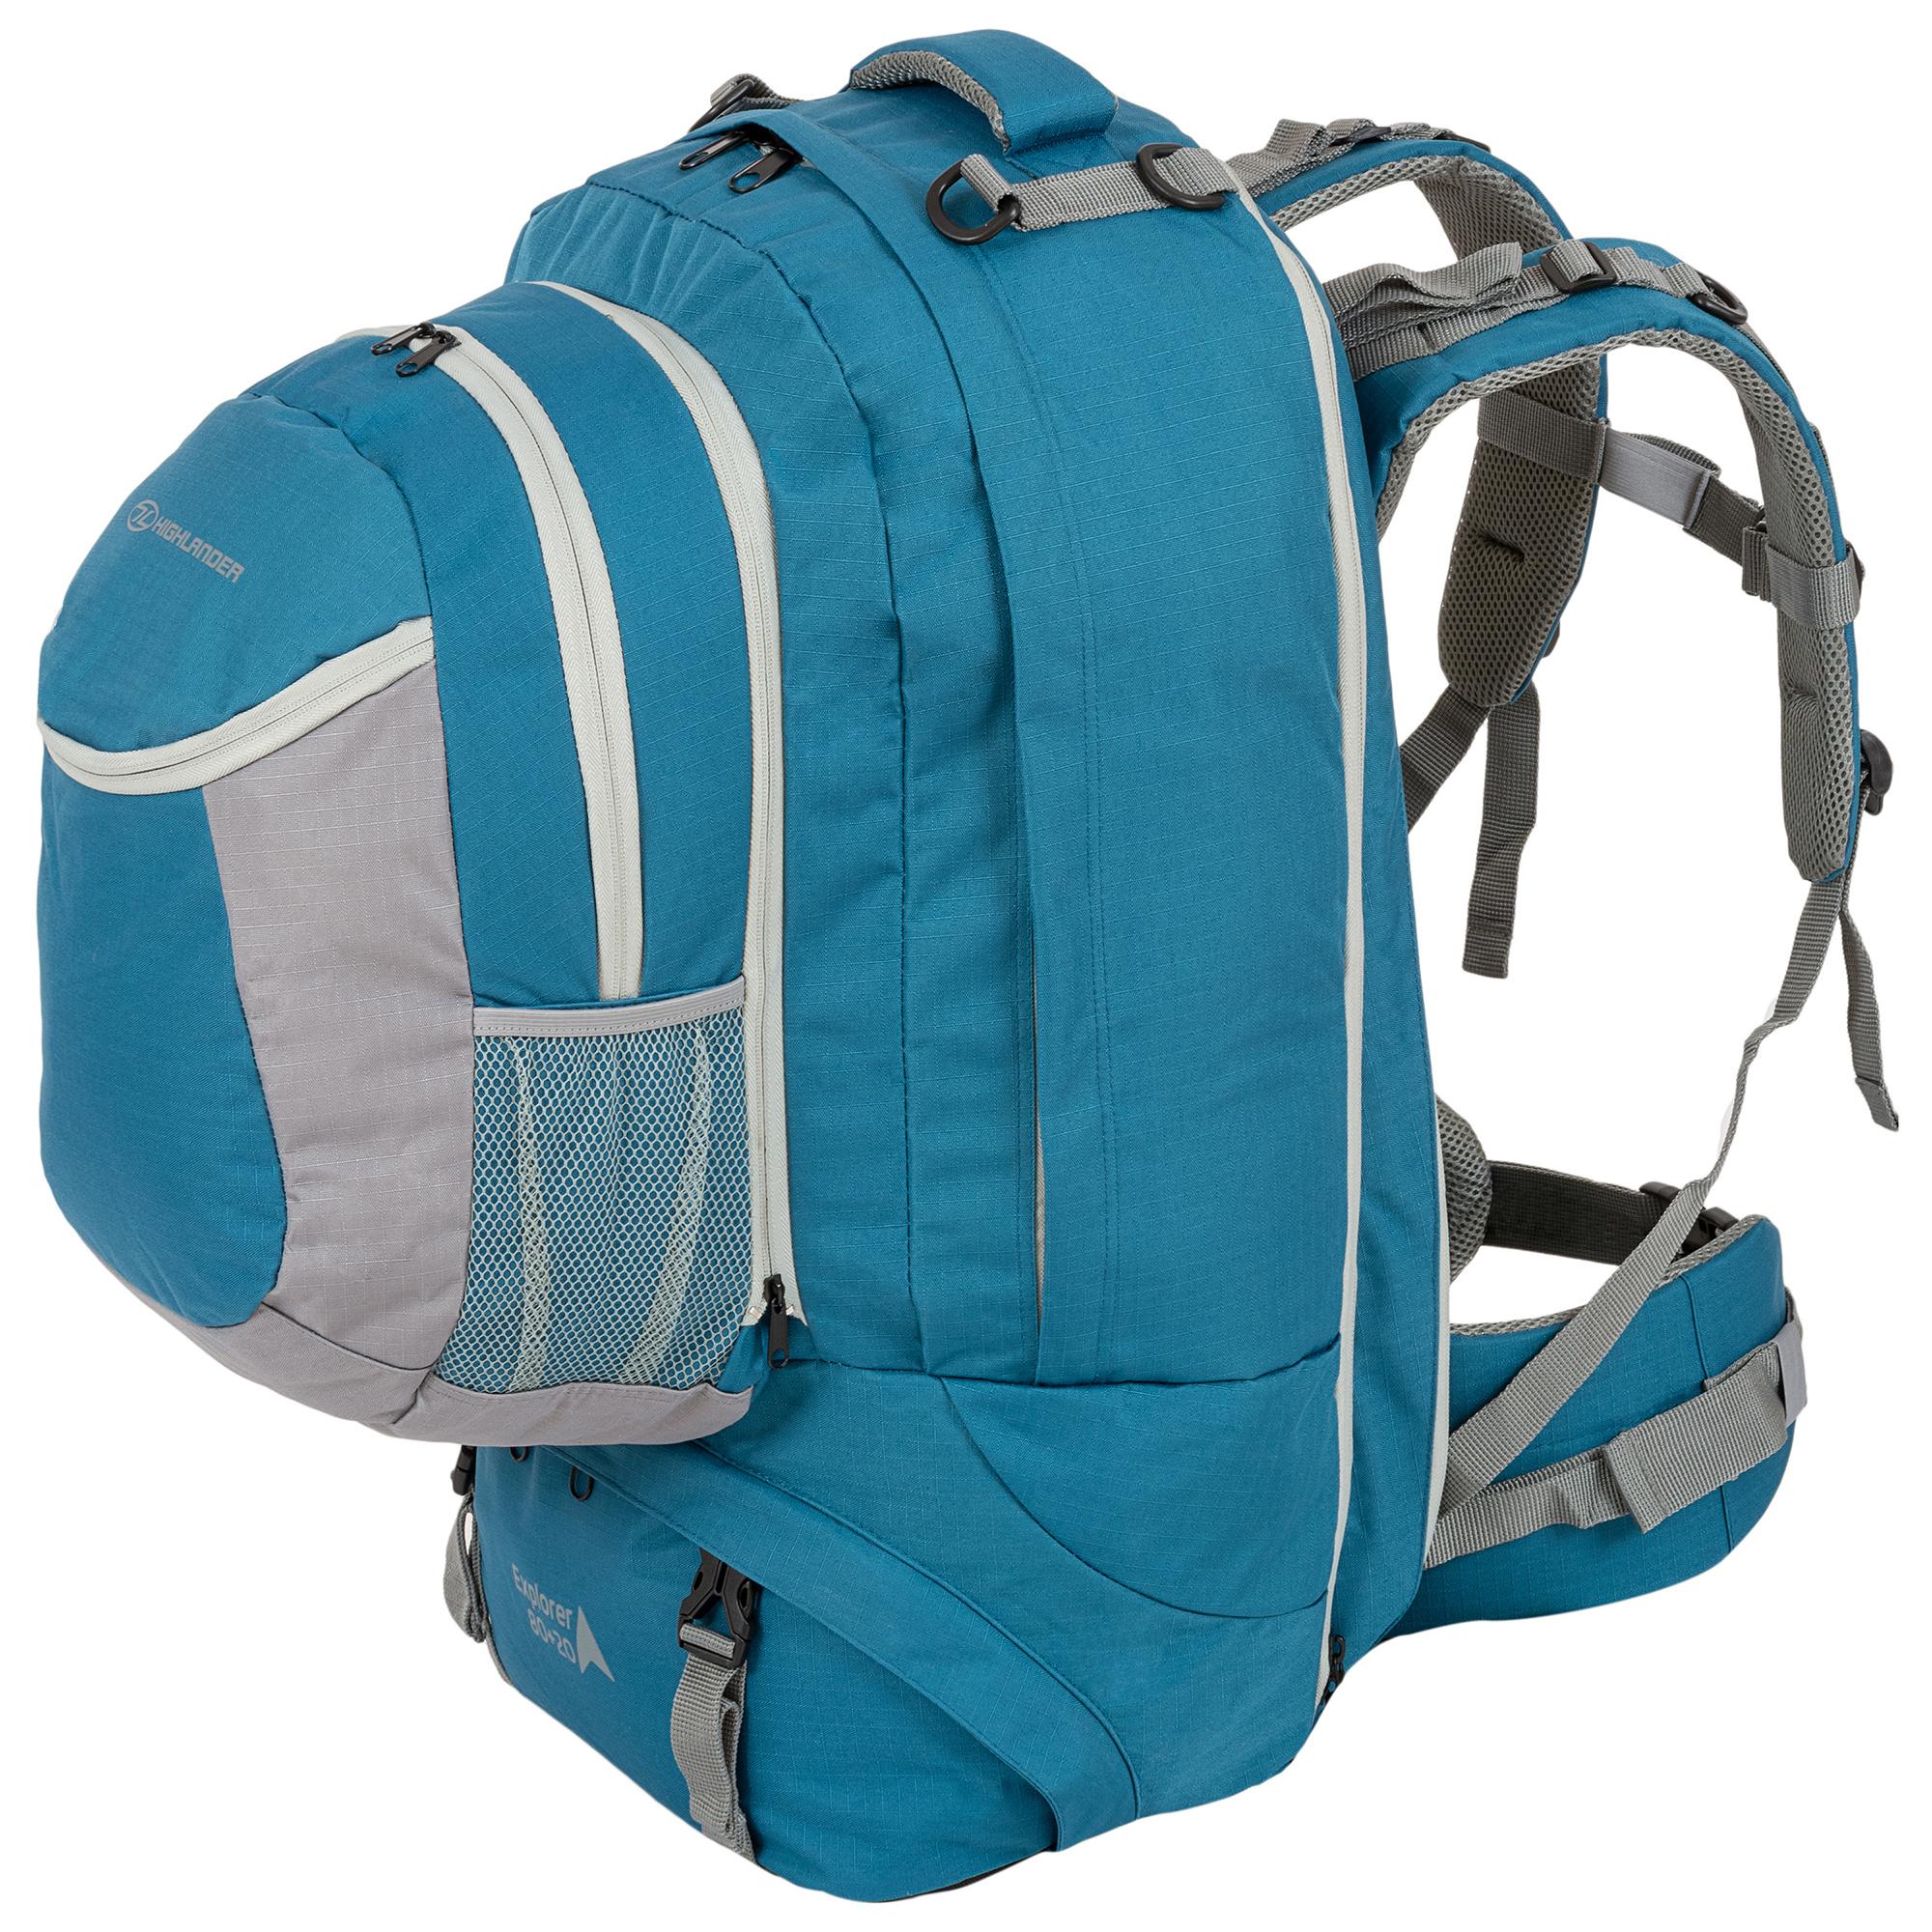 e98642b5c4a Highlander - Explorer - travelbag - 80 + 20l - blauw - Kopen ...